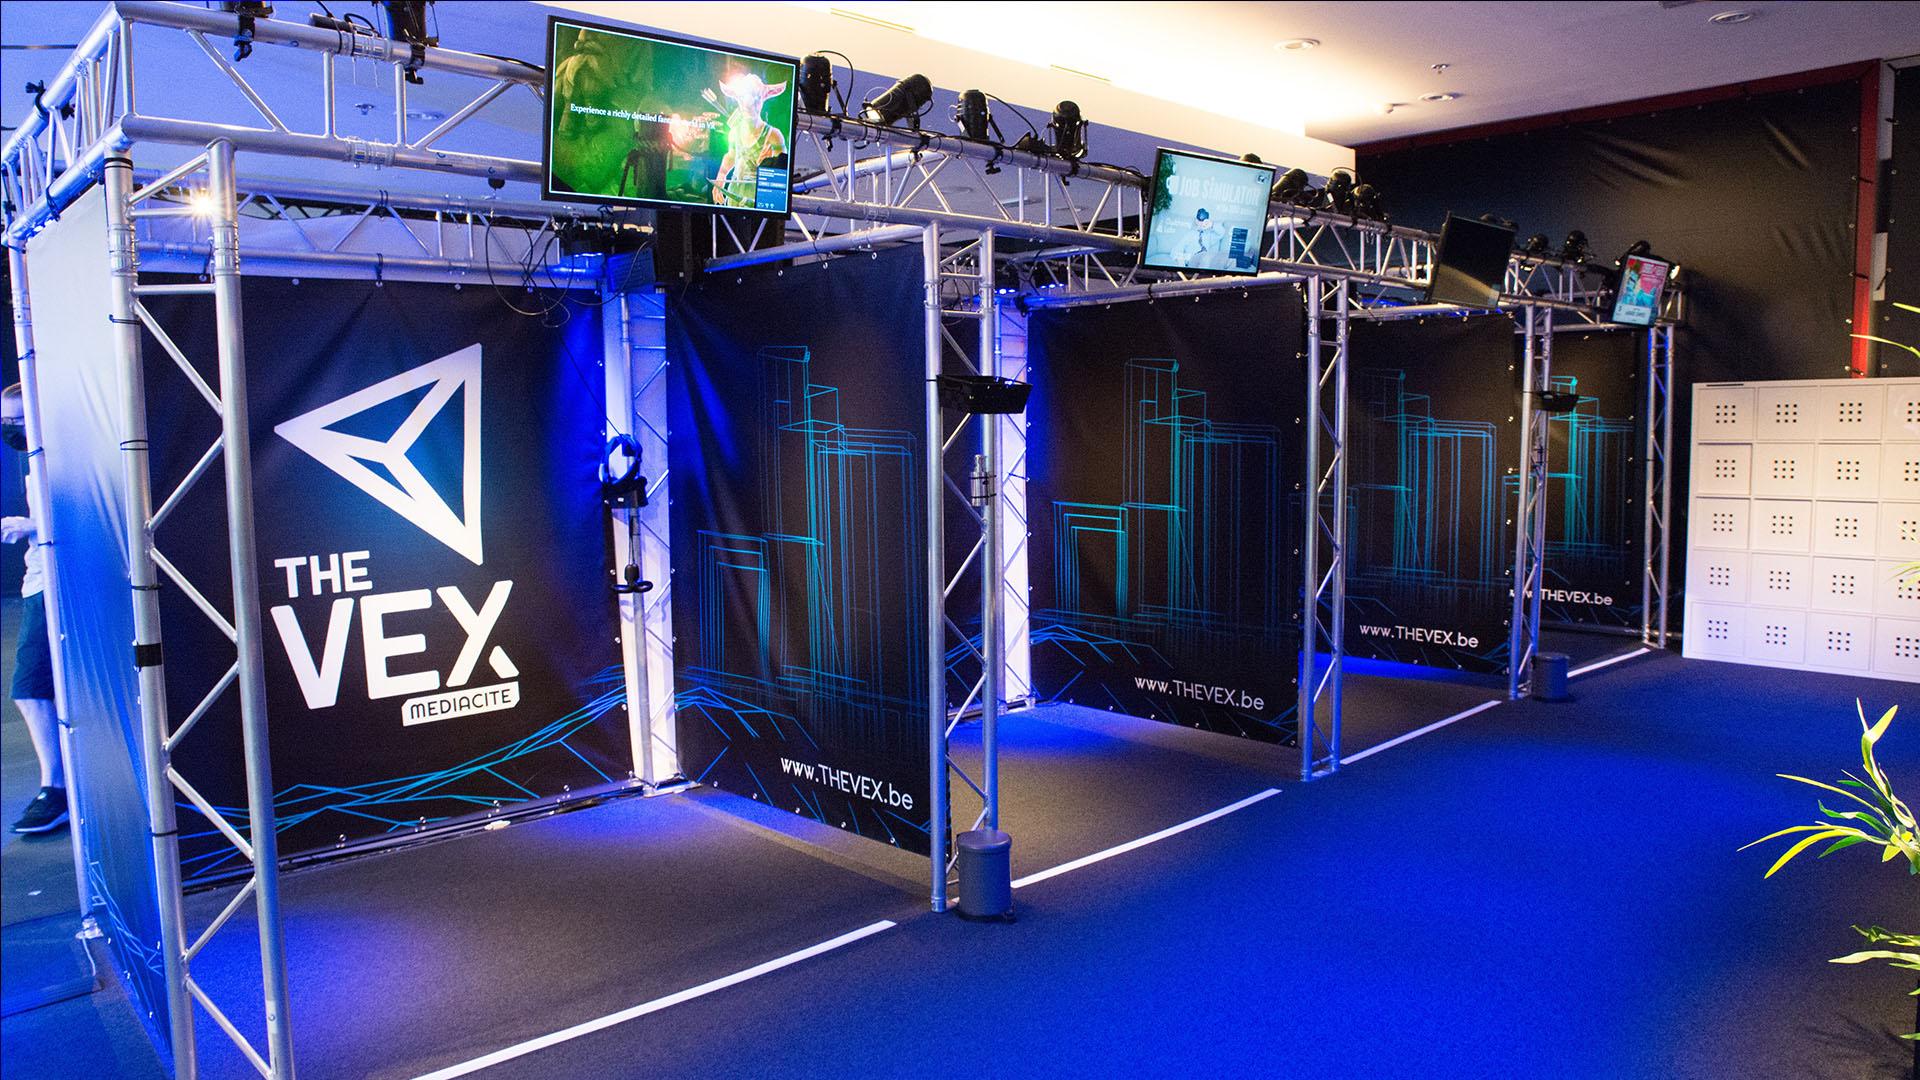 VEX Arcade standalone VR